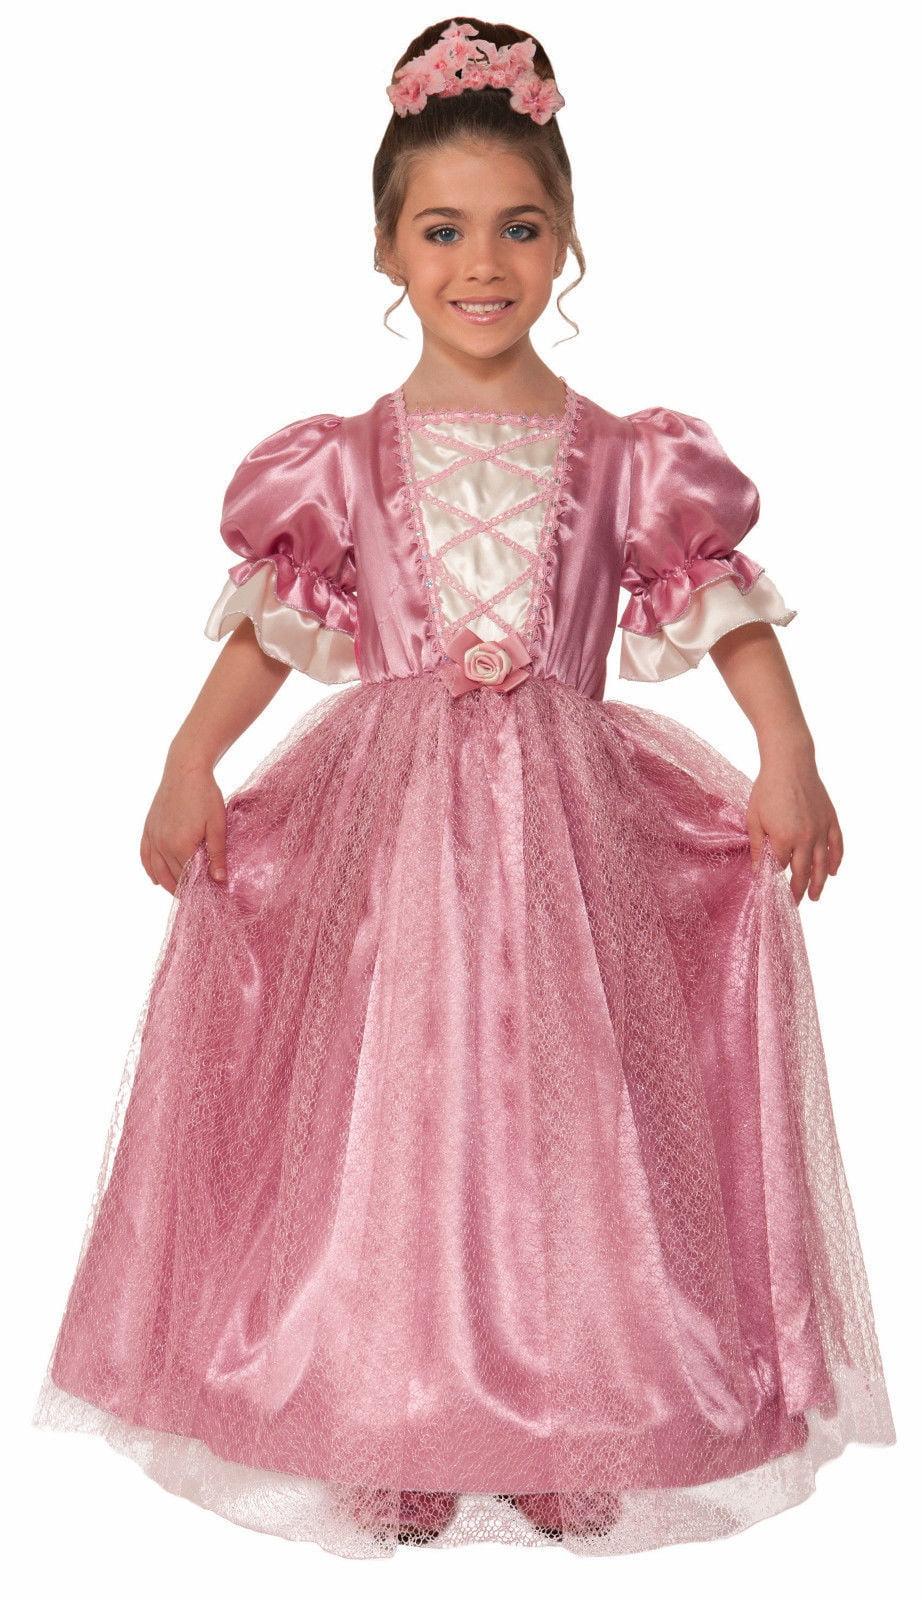 Elegant Princess Lady Rose Costume Fancy Dress Gown Pink Rose Hoop ...